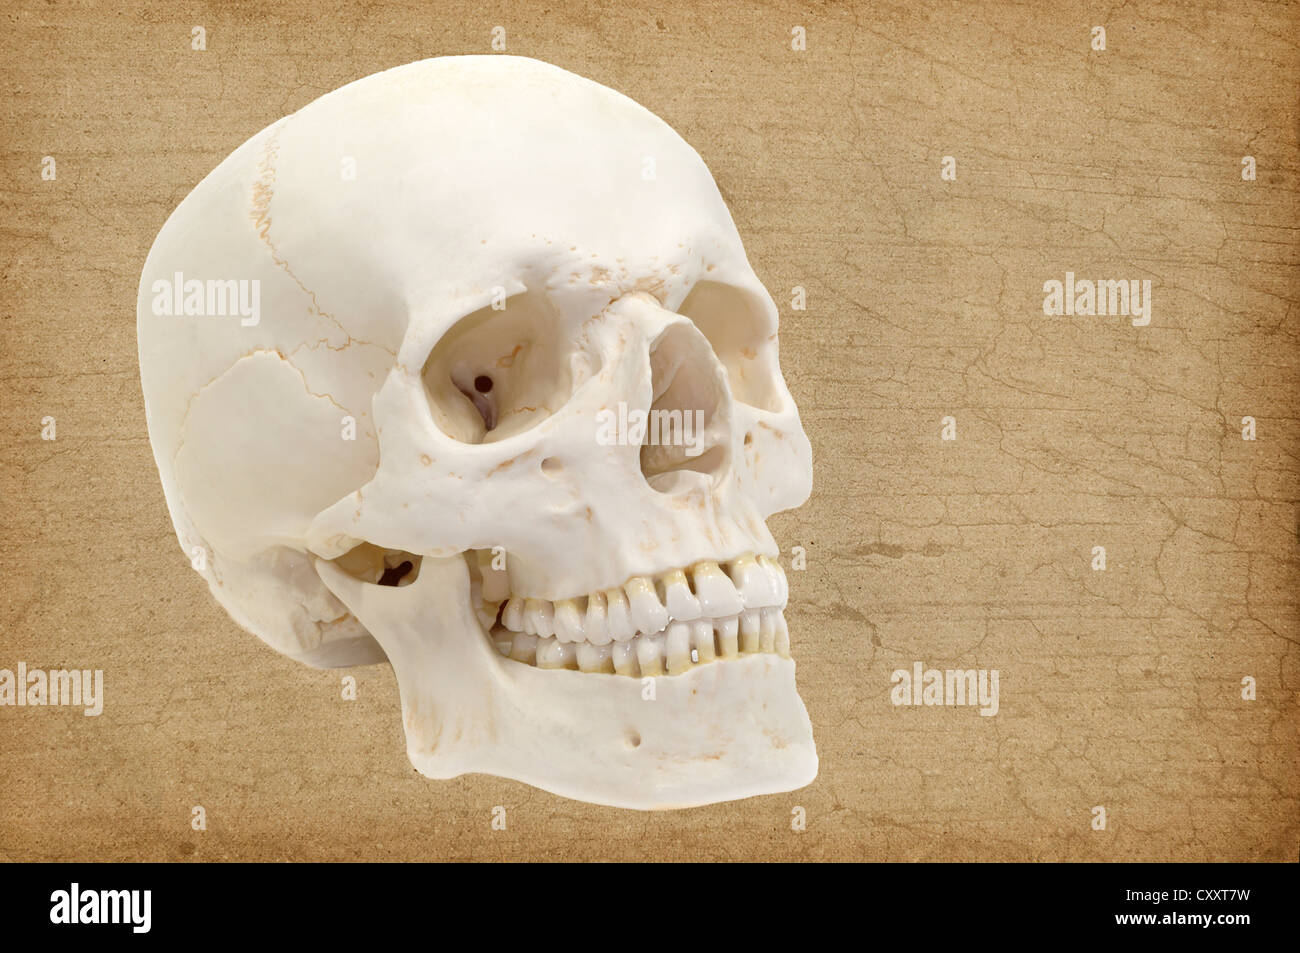 Human skull, anatomical model, anatomy - Stock Image